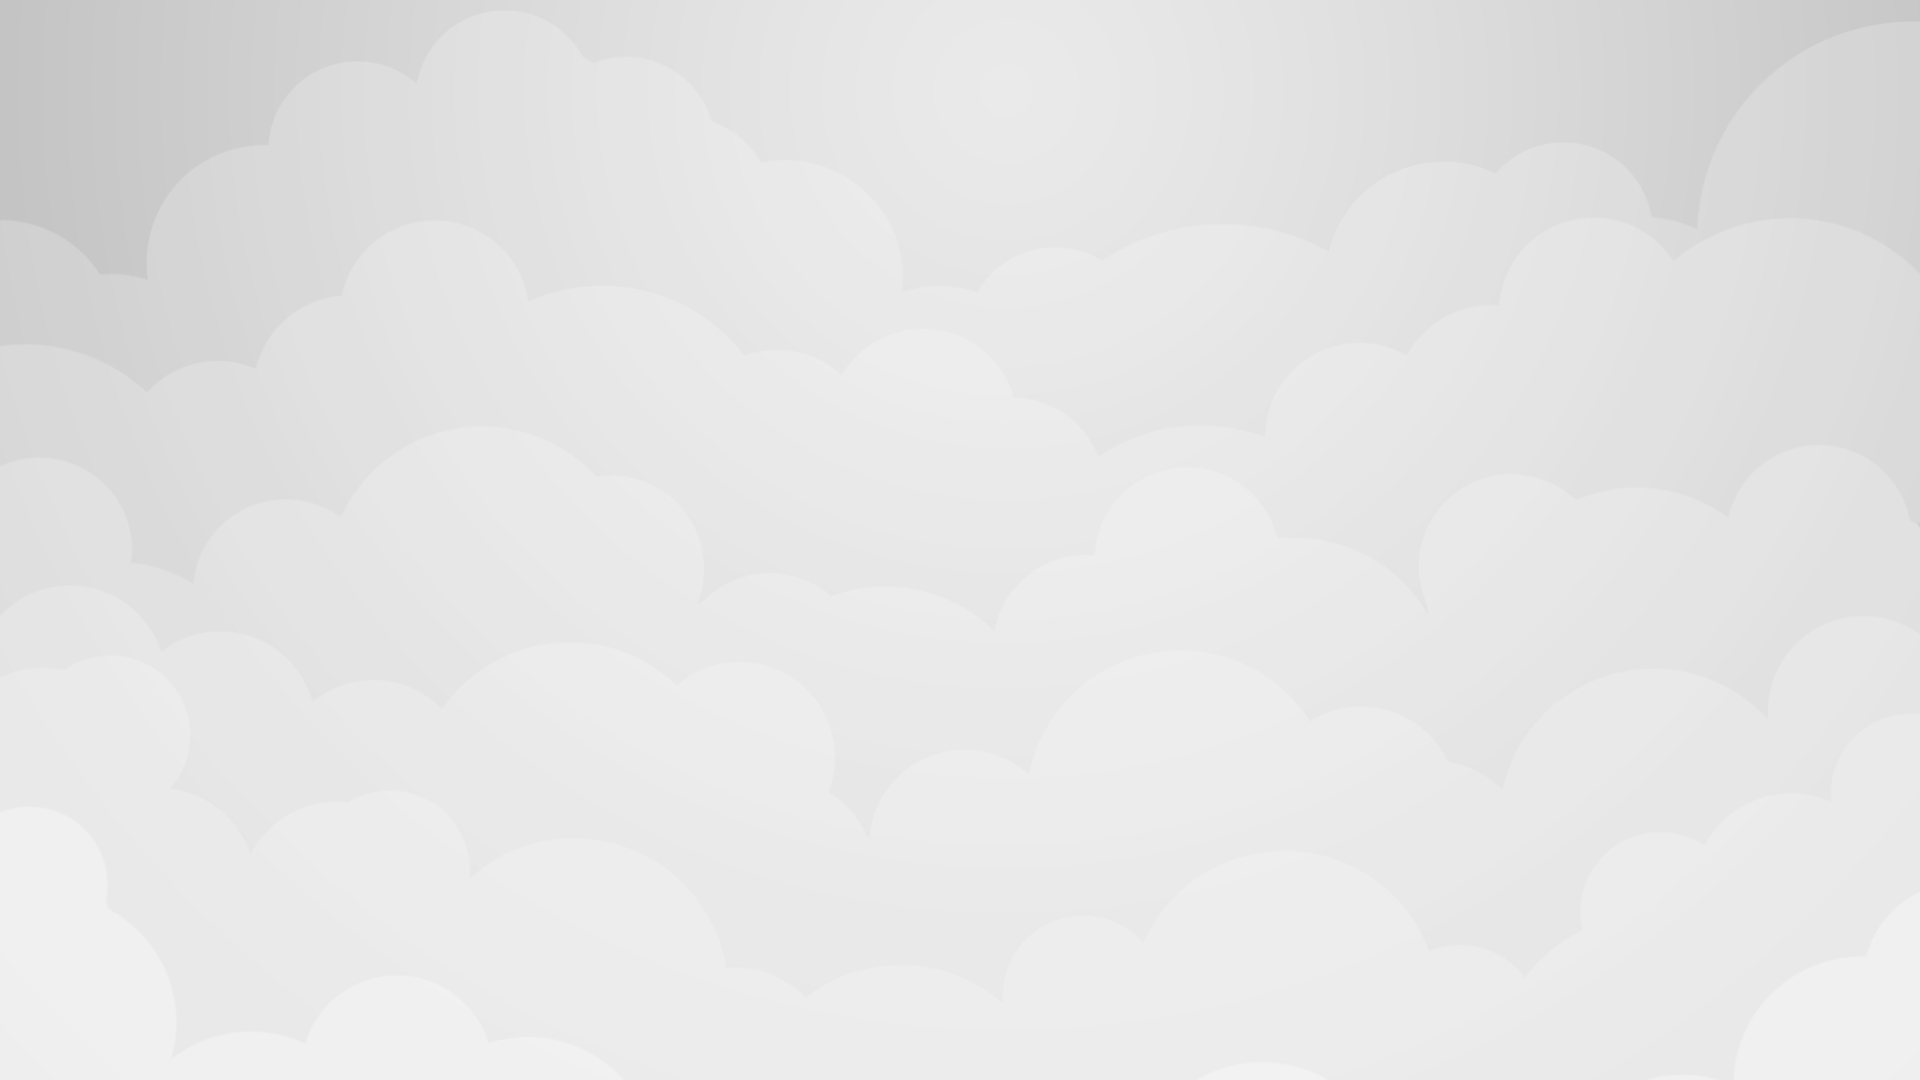 iphone 100 release date